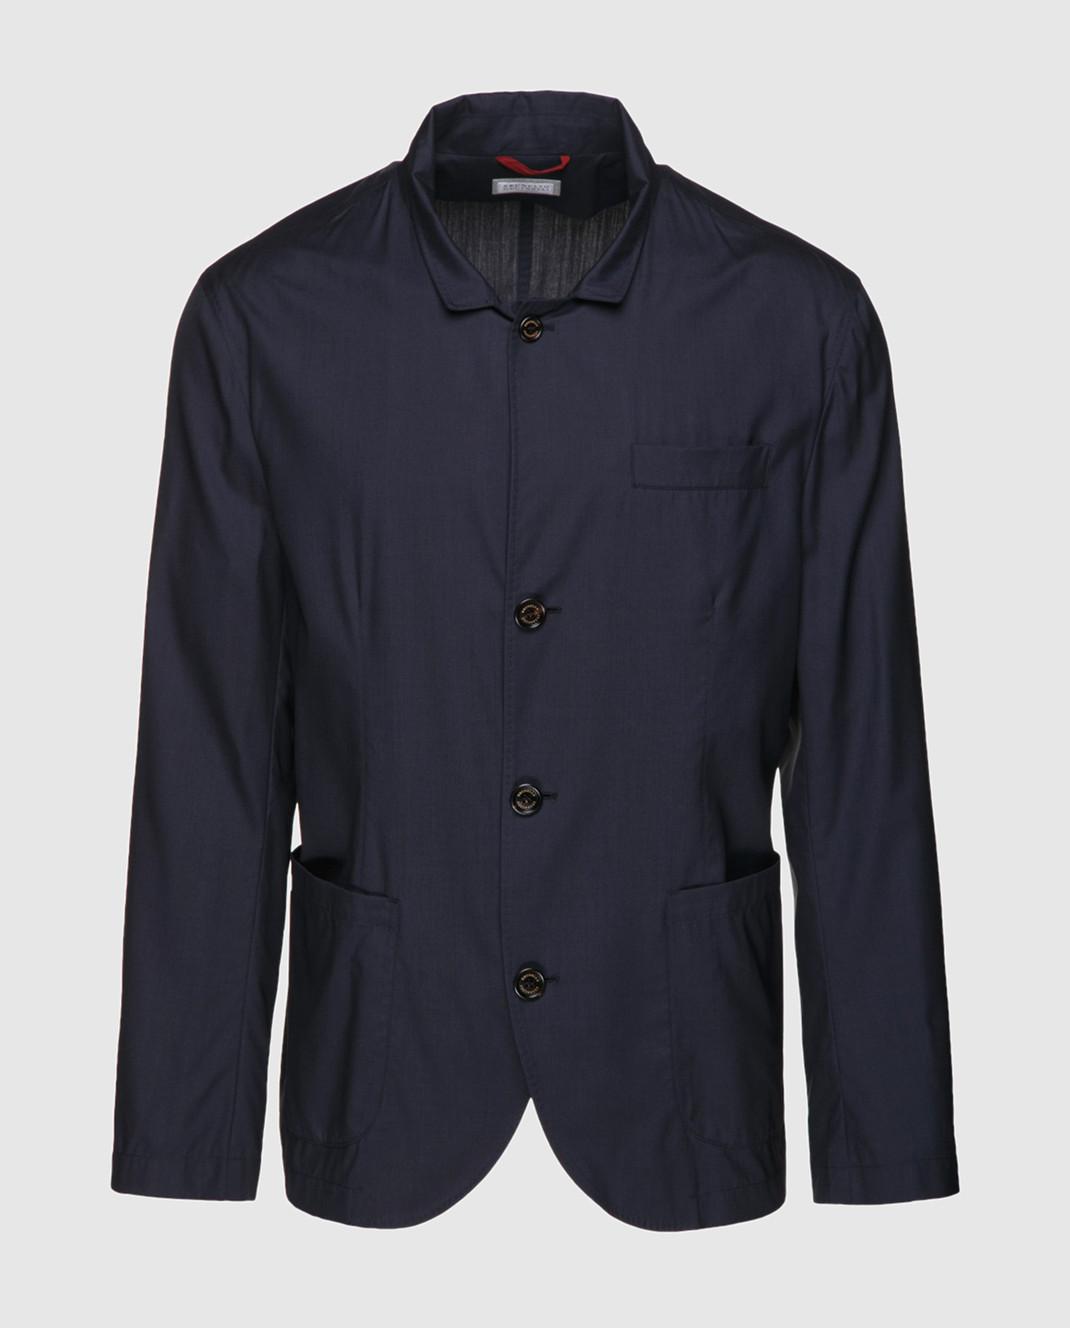 Brunello Cucinelli Темно-синий пиджак MH4626132